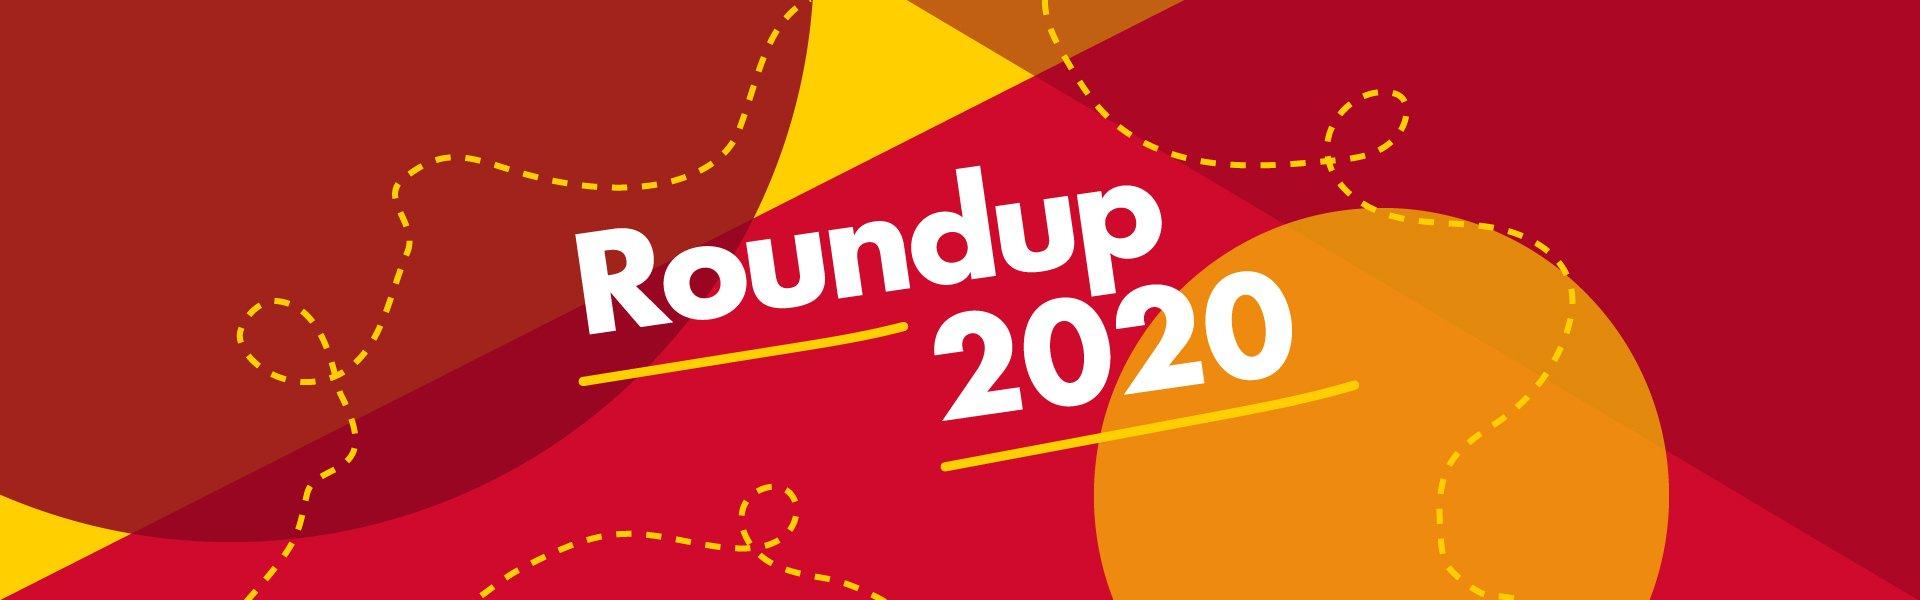 Roundup 2020